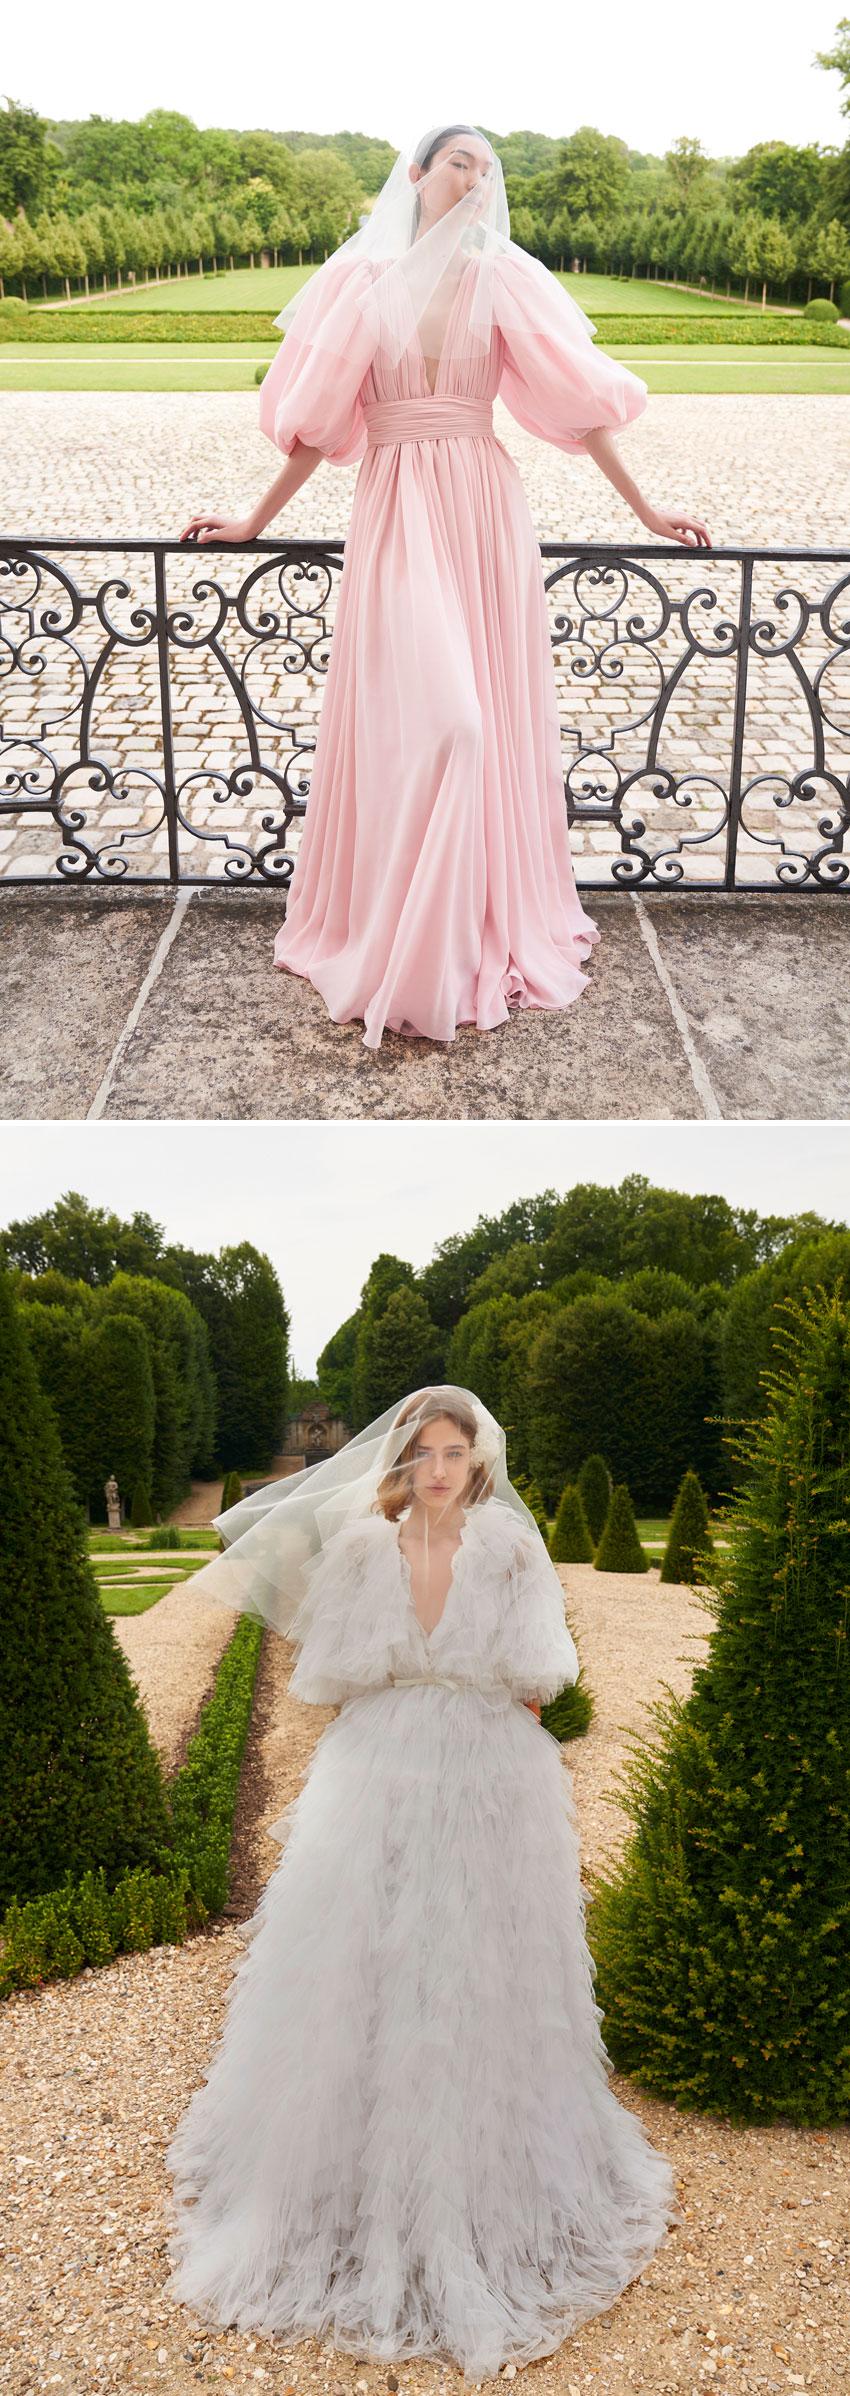 Giambattista Valli first bridal collection contains 17 dresses